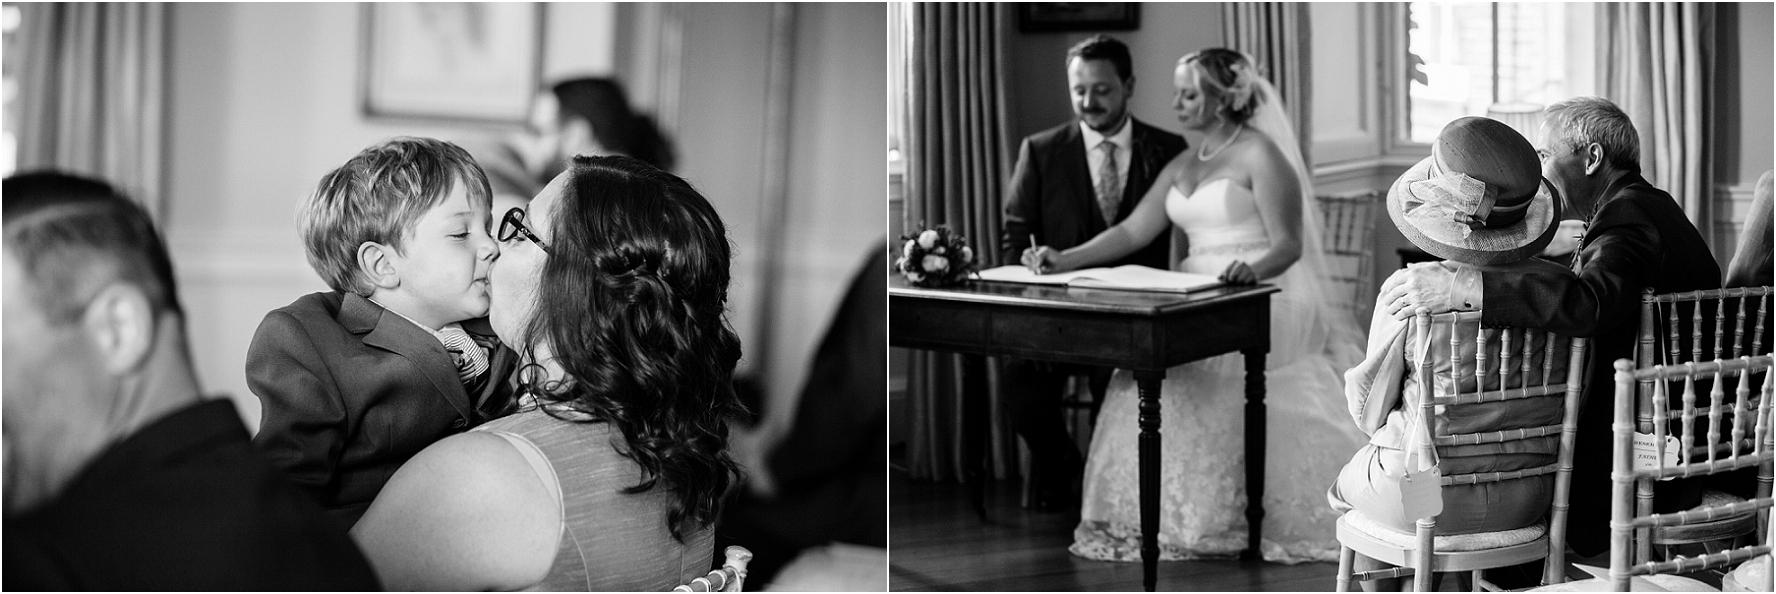 wedding-photography-the-orangery-settringham_0424